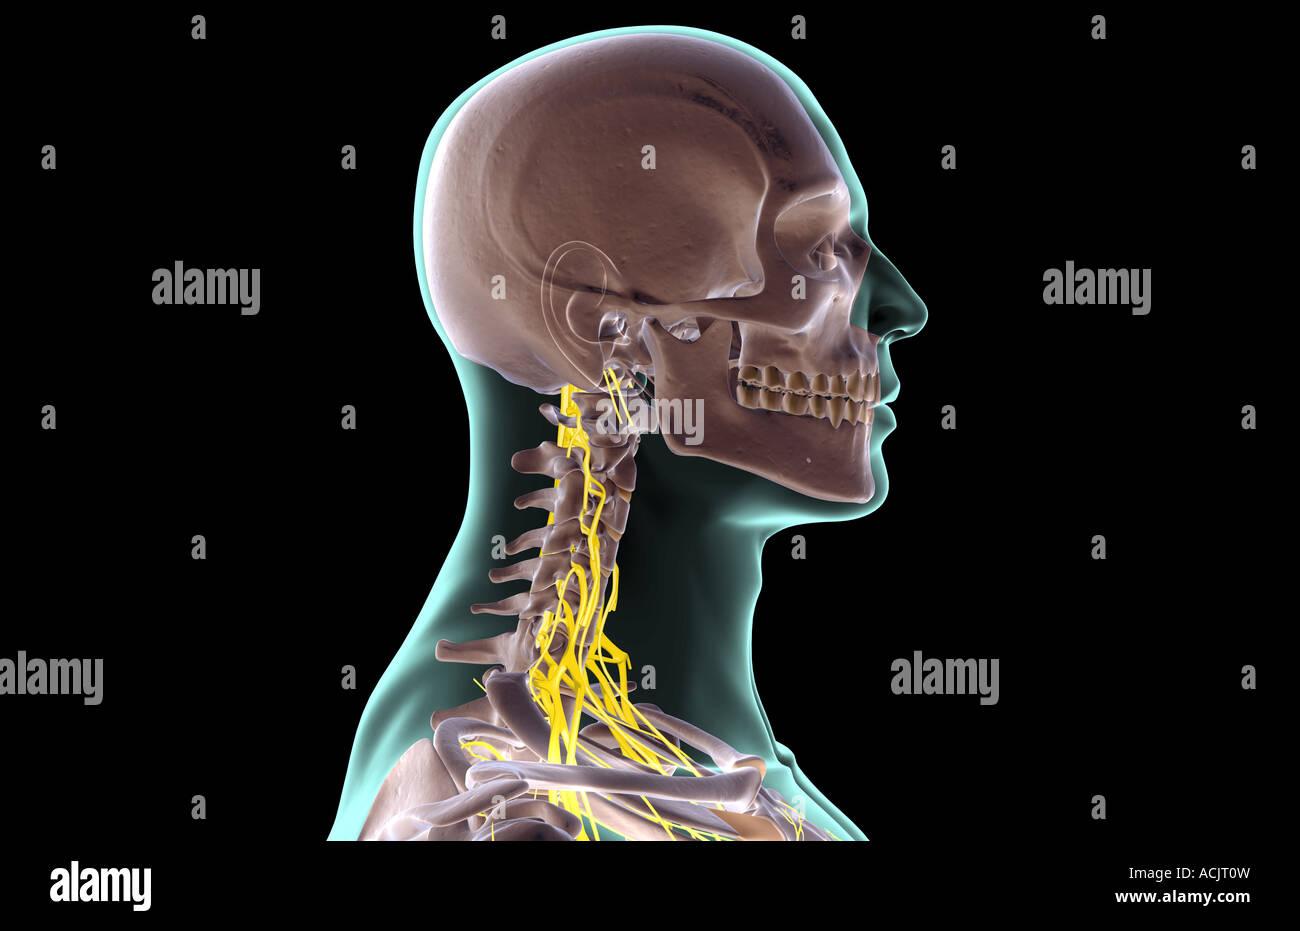 Nerves Neck Stockfotos & Nerves Neck Bilder - Seite 3 - Alamy